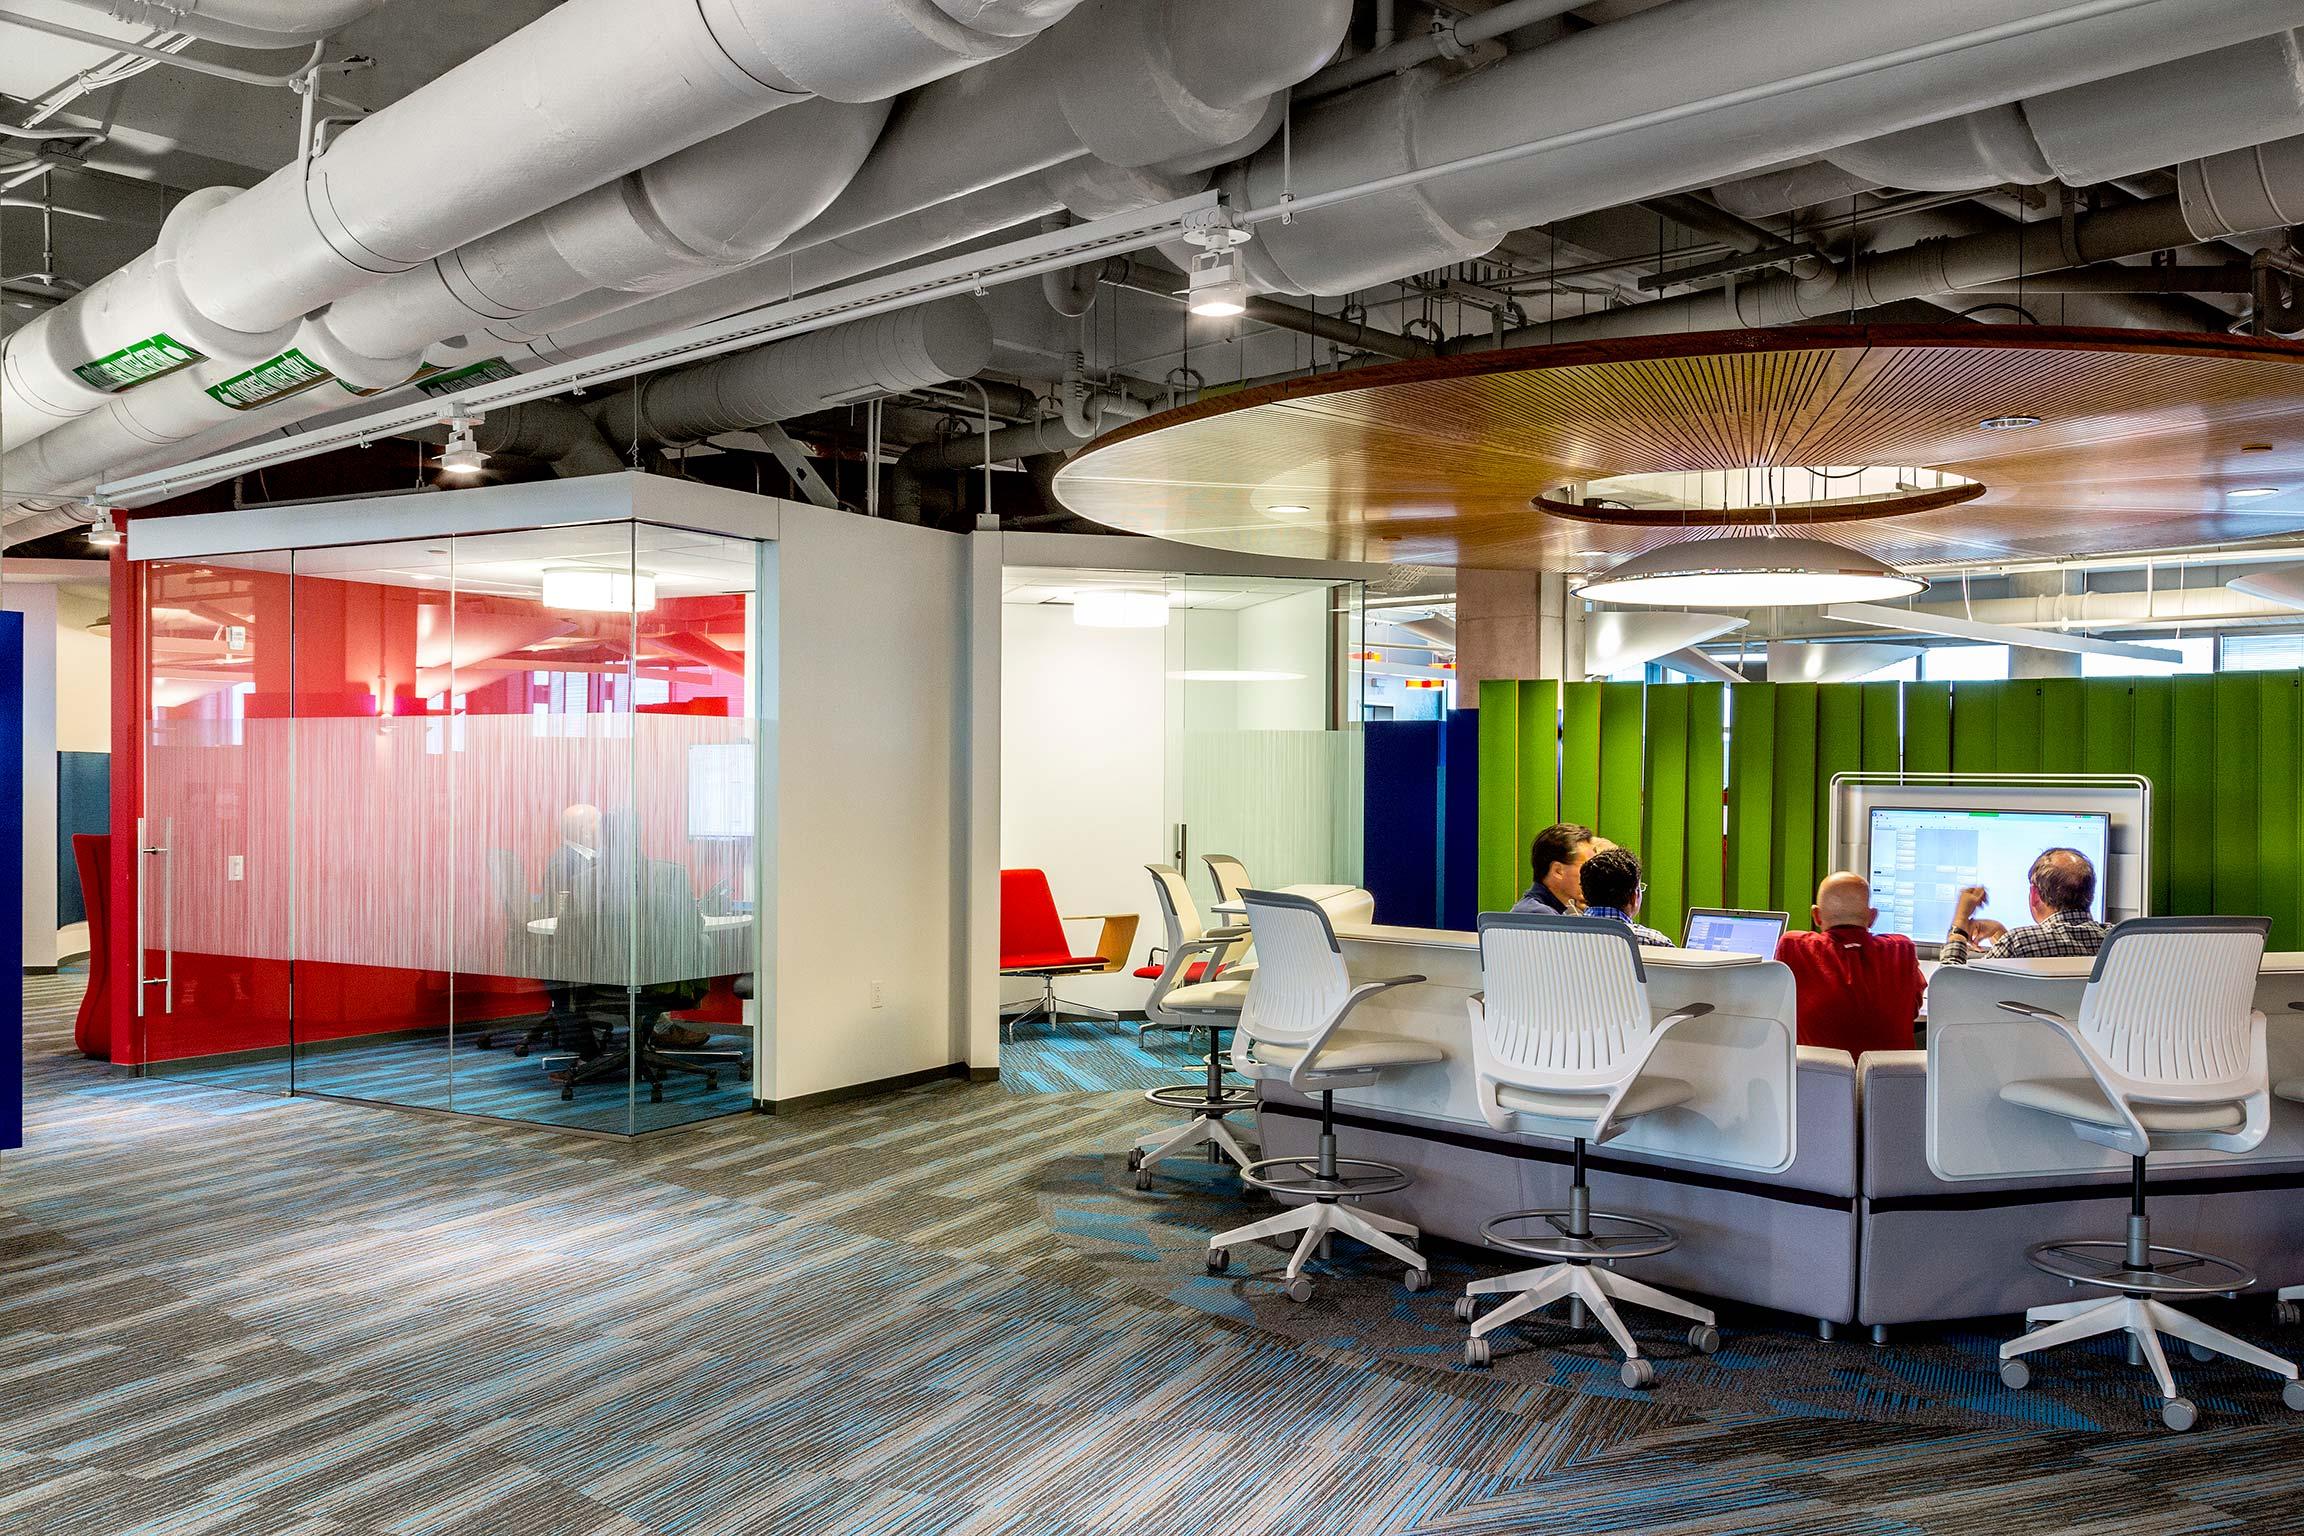 Interior view of Intergraph Headquarters